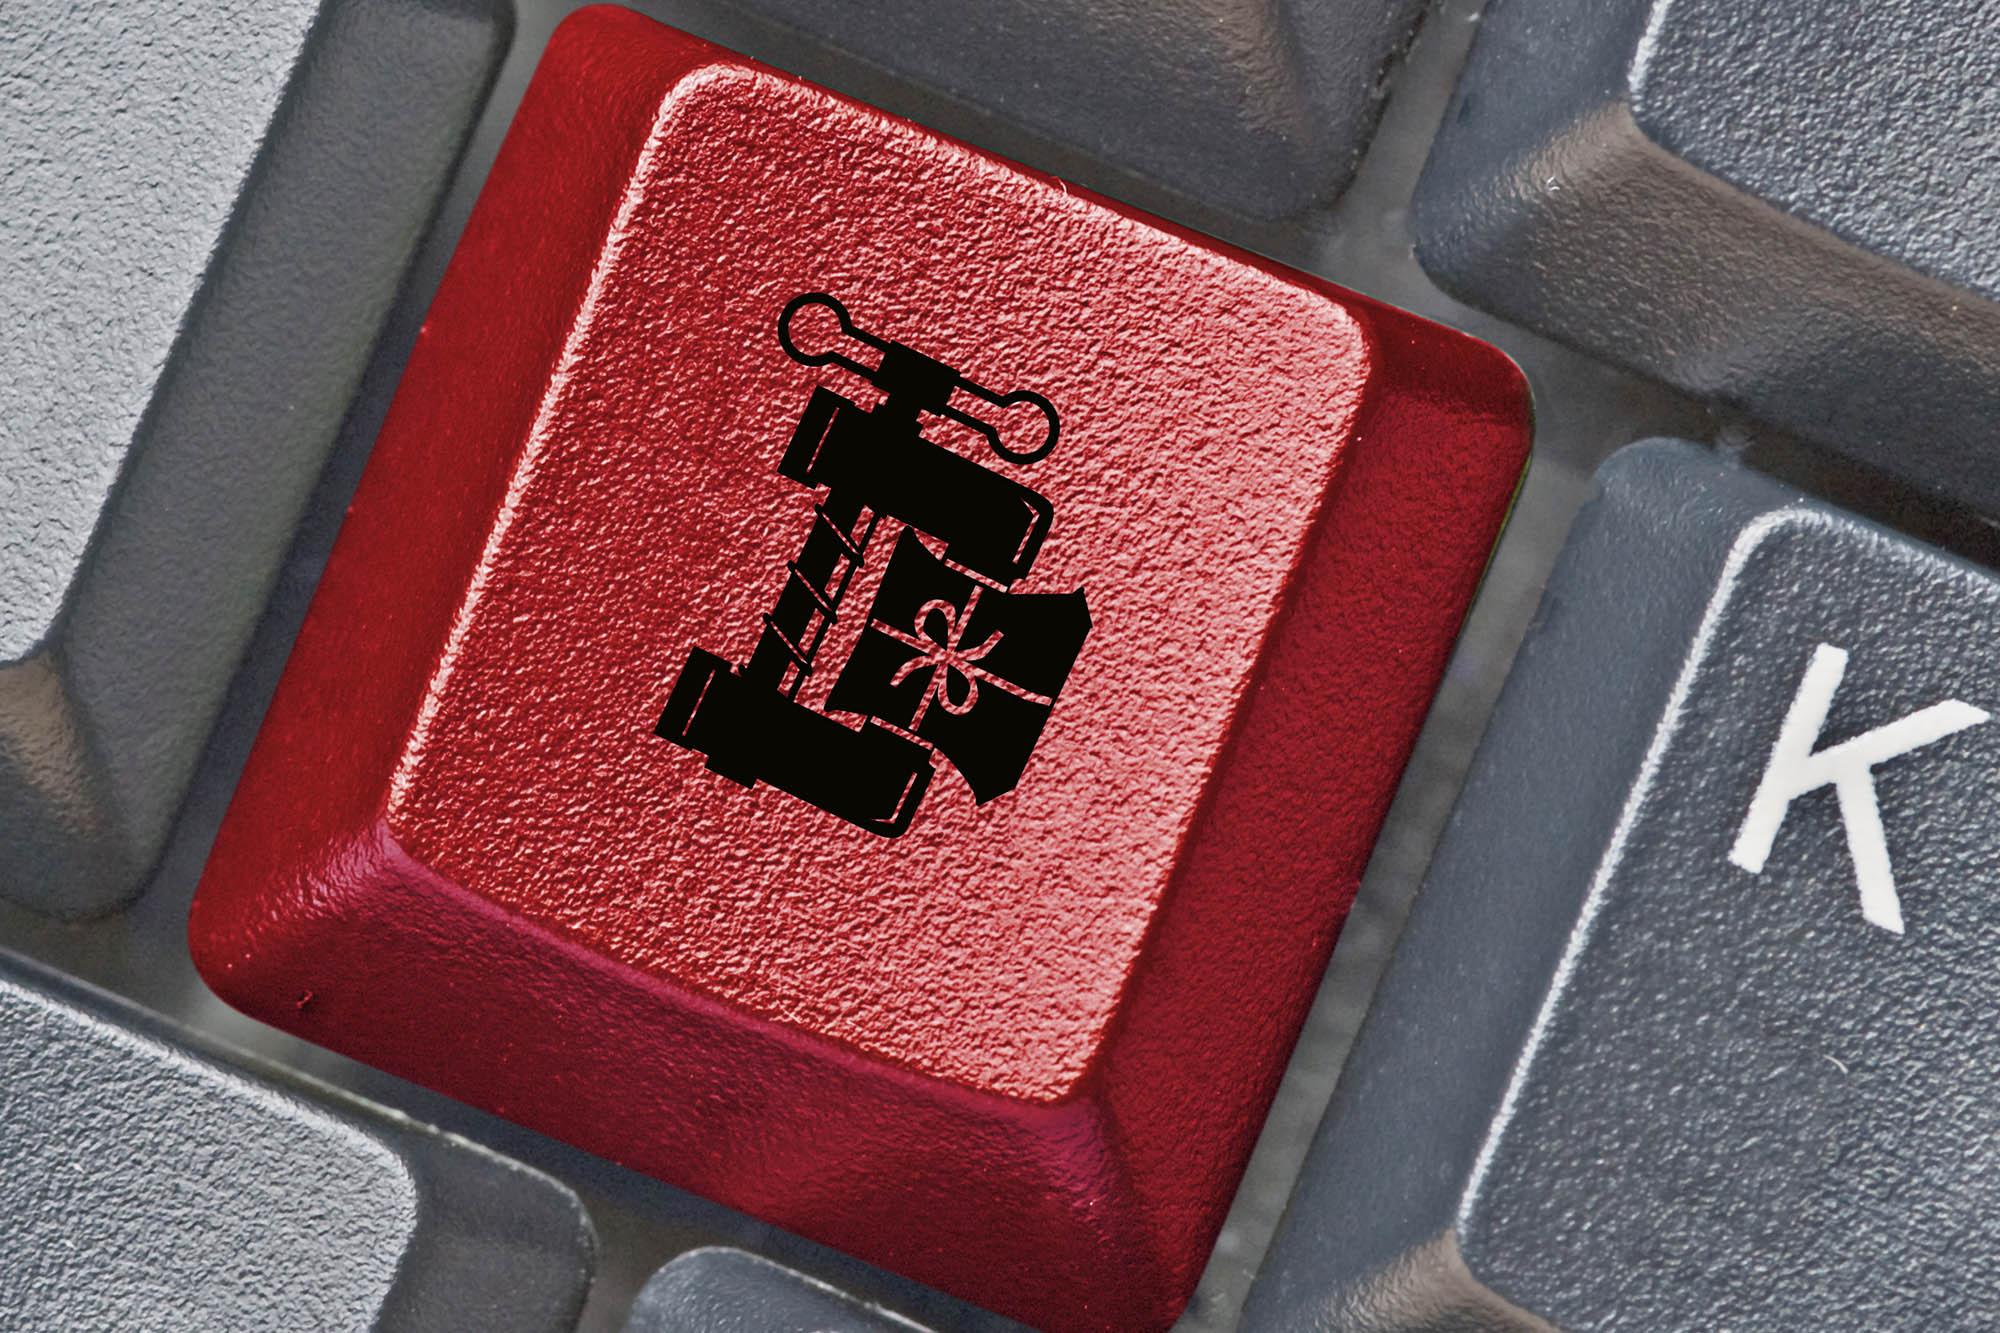 button compression keyboard red icon symbol file